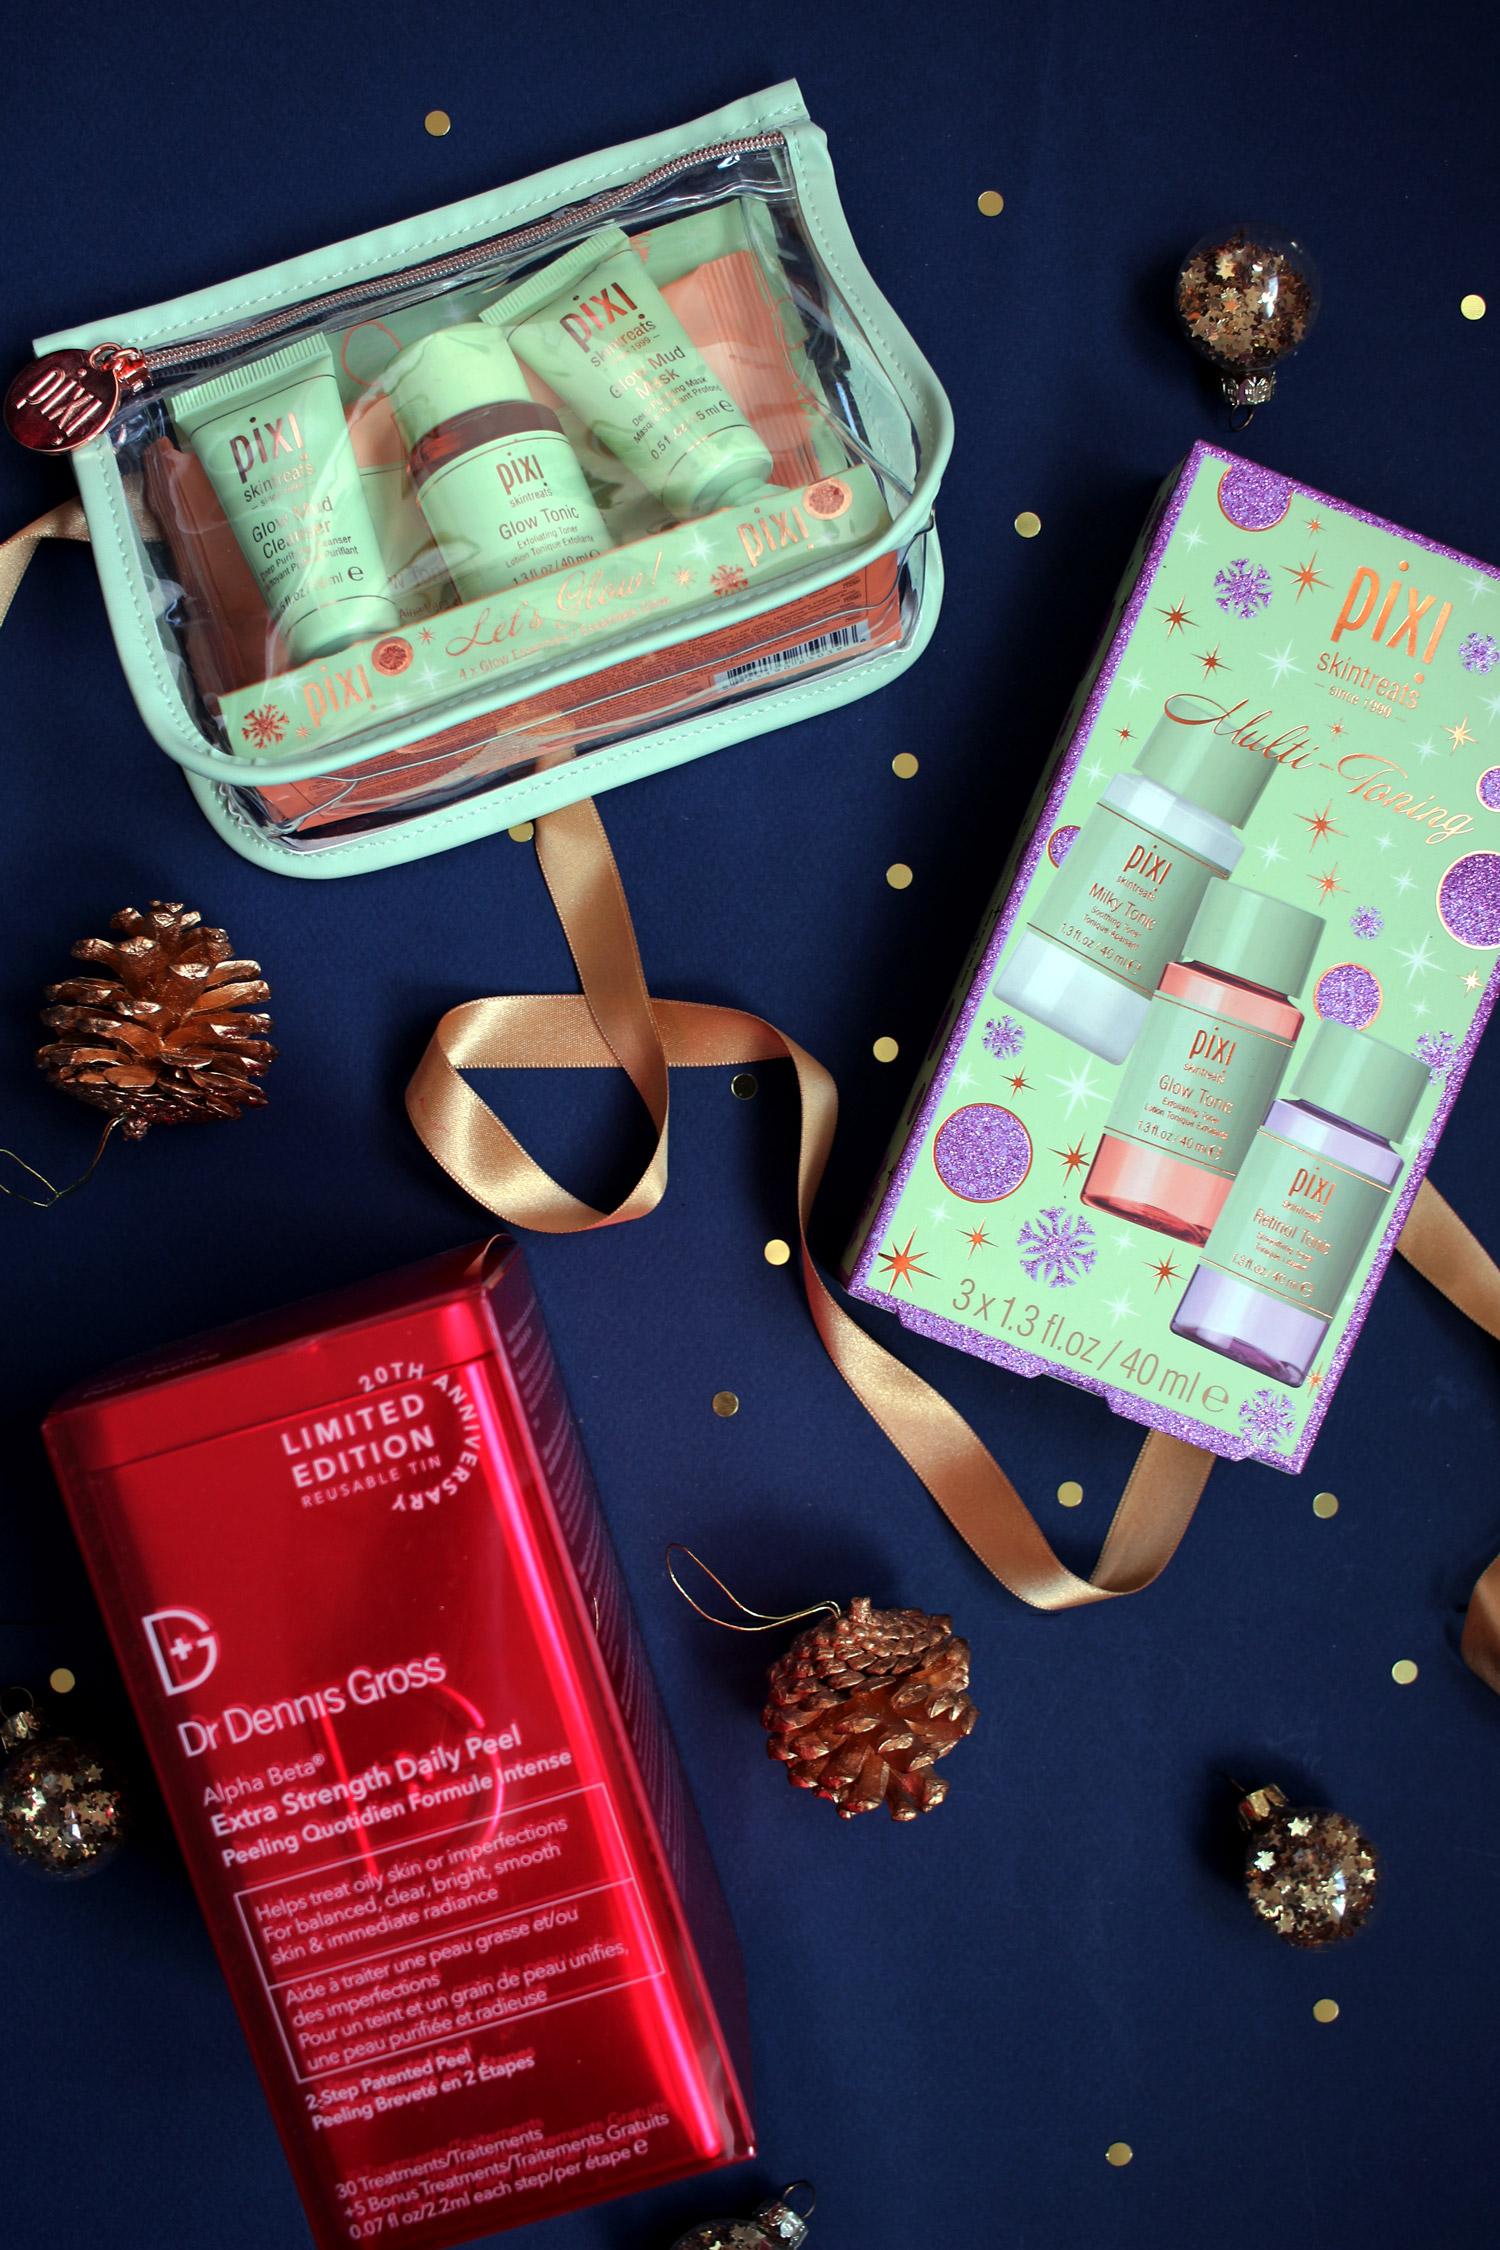 christmas-2020-beauty-gift-guide-skincare-pixi-glow-set-dennis-gross-peel